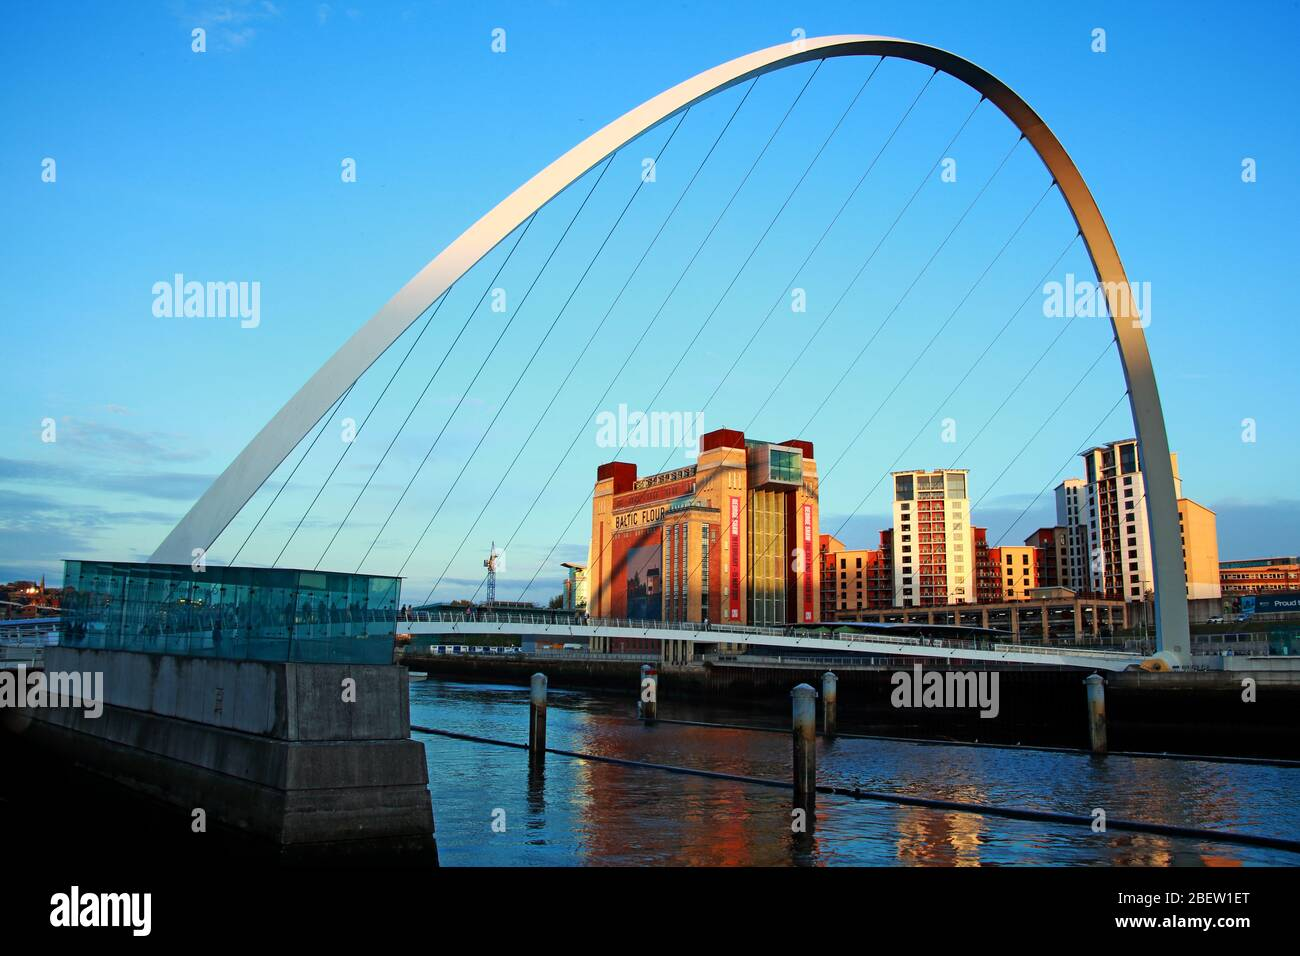 GoTonySmith,@HotpixUK,HotpixUK,river,riverside,water,city,North East,England,Geordie,Tyne River,Newcaste upon Tyne,evening,UK,Tyne,River,Newcaste,upon Tyne,Gateshead,Sage,NE,bridge,river side,economy,Tyneside conurbation,Tyne bridge,Gateshead Millennium Bridge,Millennium Bridge,Pons Aelius,shipbuilding,coal,coals from Newcastle,fishy on a dishy,spring,NE1,River Tyne Quayside,Quayside,Gatesheads Quays arts quarter